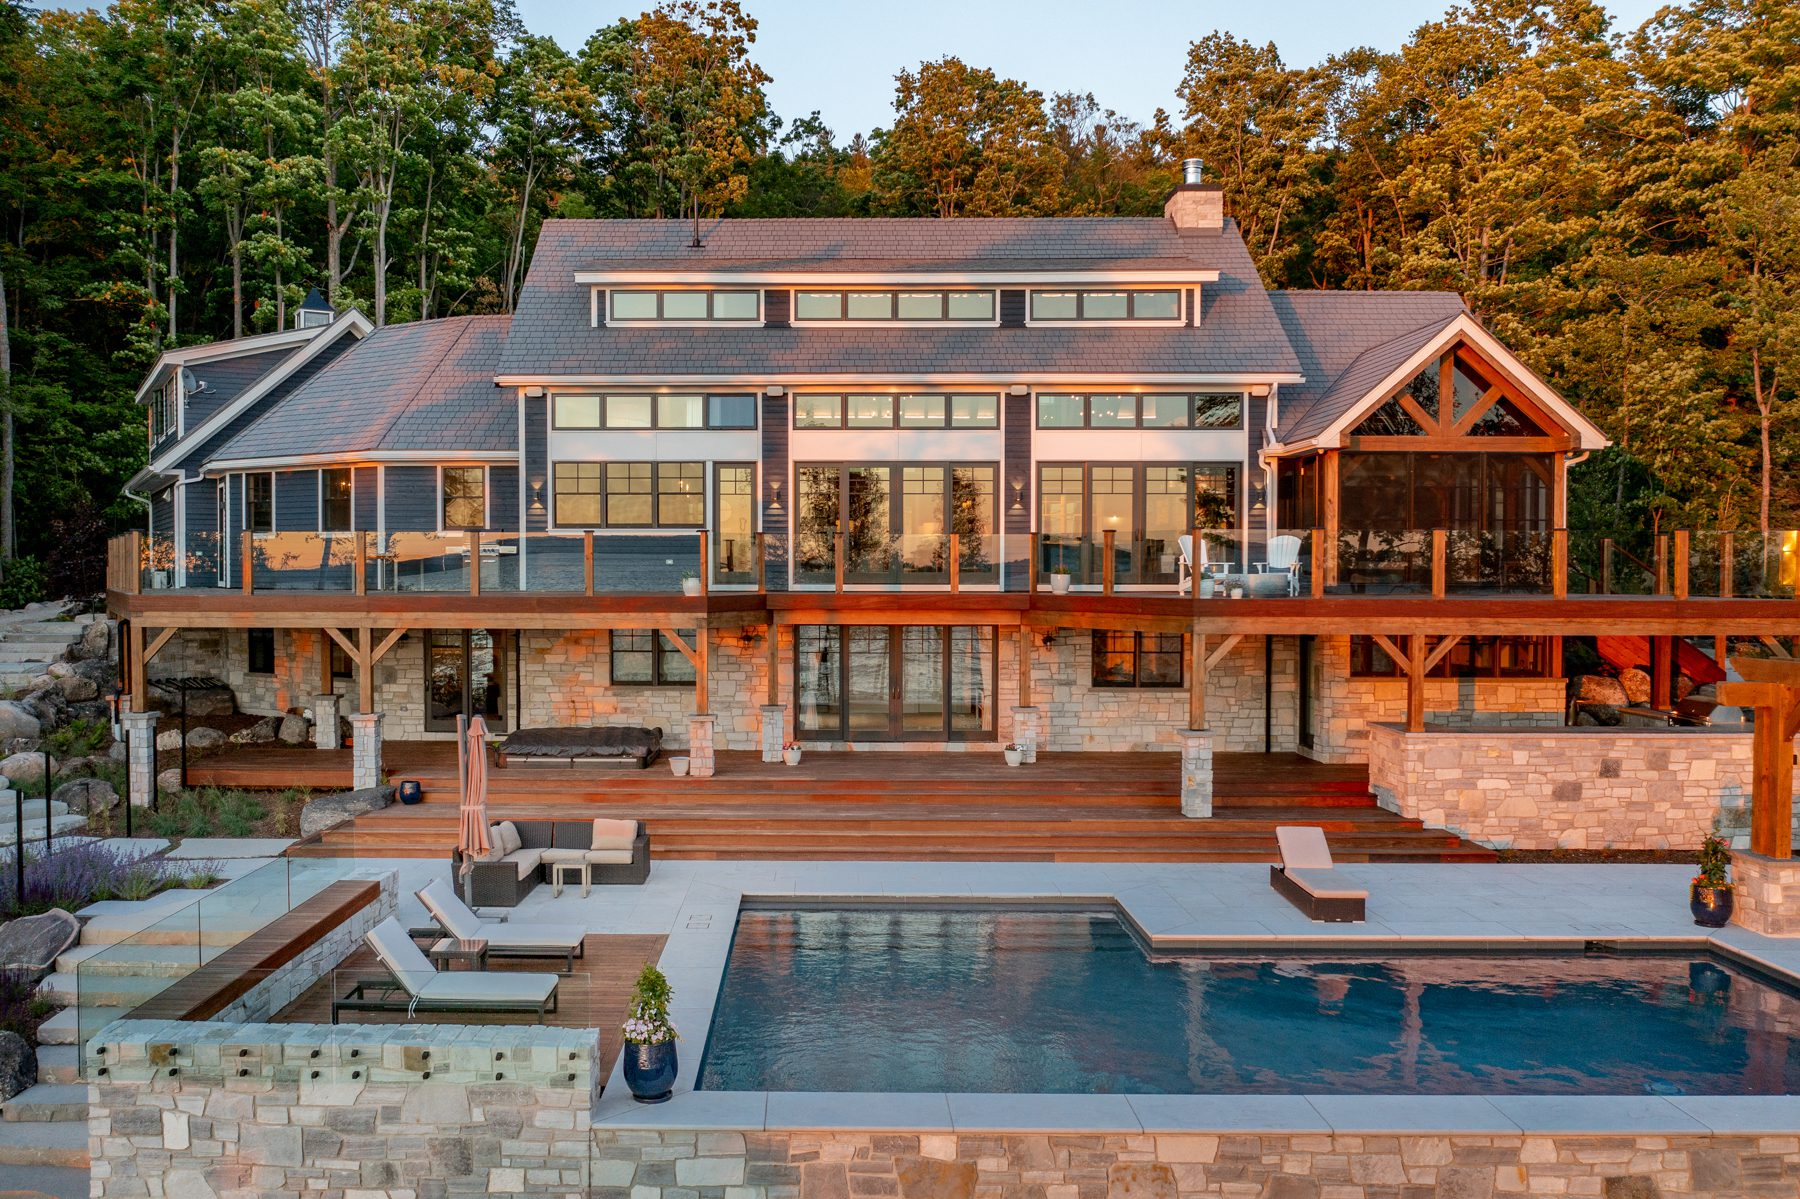 Normerica-Timber-Homes-Timber-Frame-Portfolio-Beachside-Bliss-Exterior-Back-view-Pool